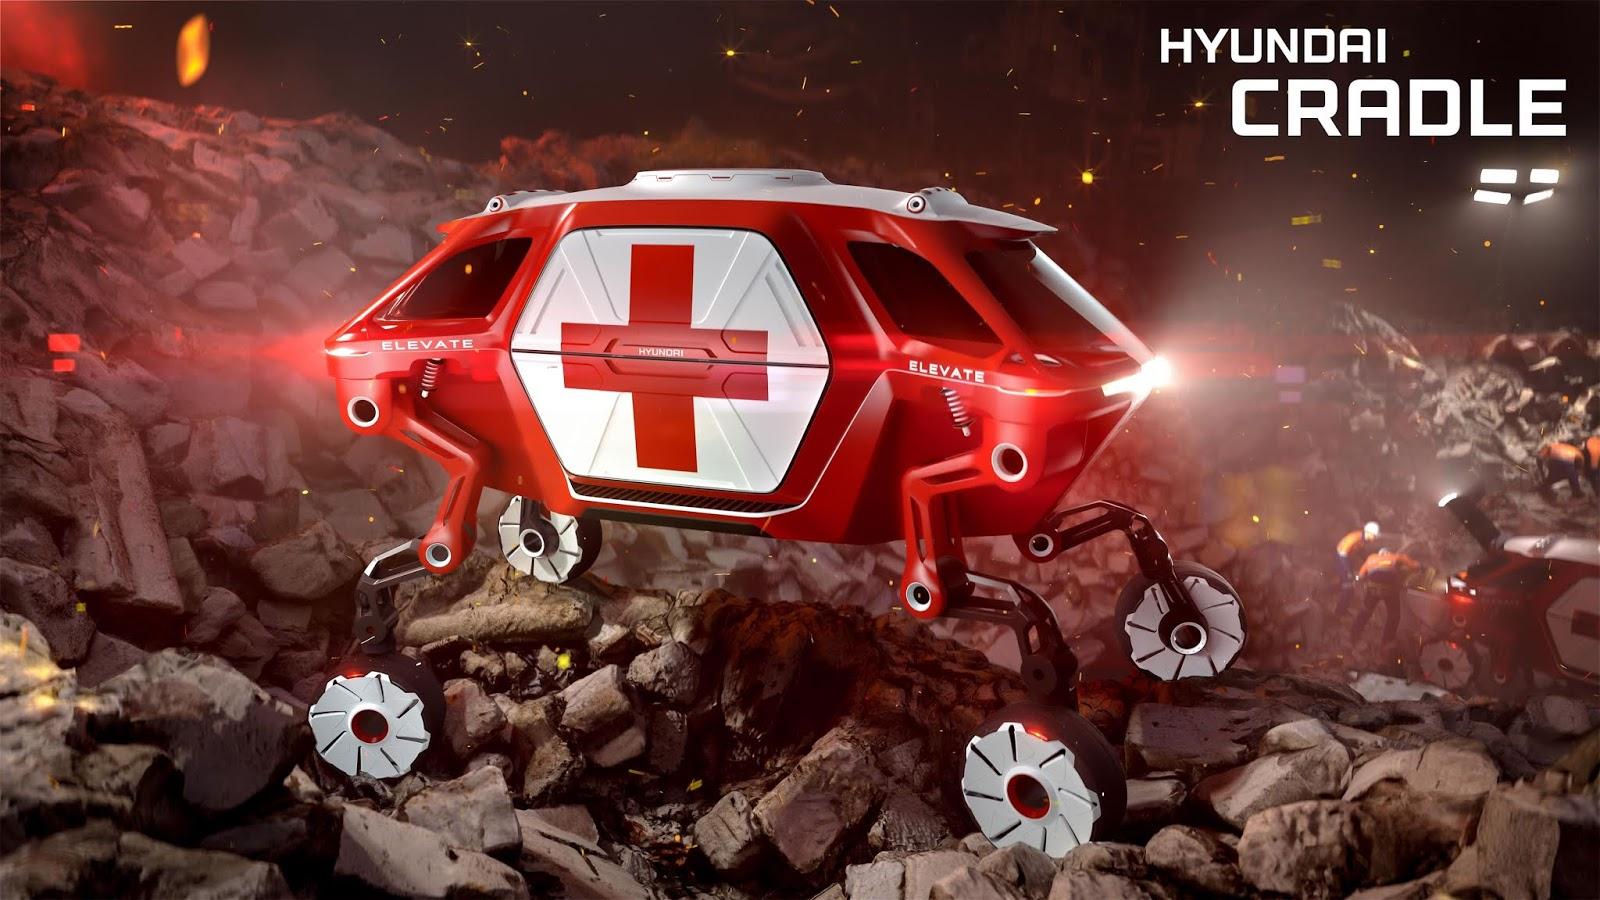 hyundai elevate concept252872529 H Hyundai έβγαλε όχημα με ρομποτικά πόδια! Electric cars, Hyundai, zblog, Τεχνολογία